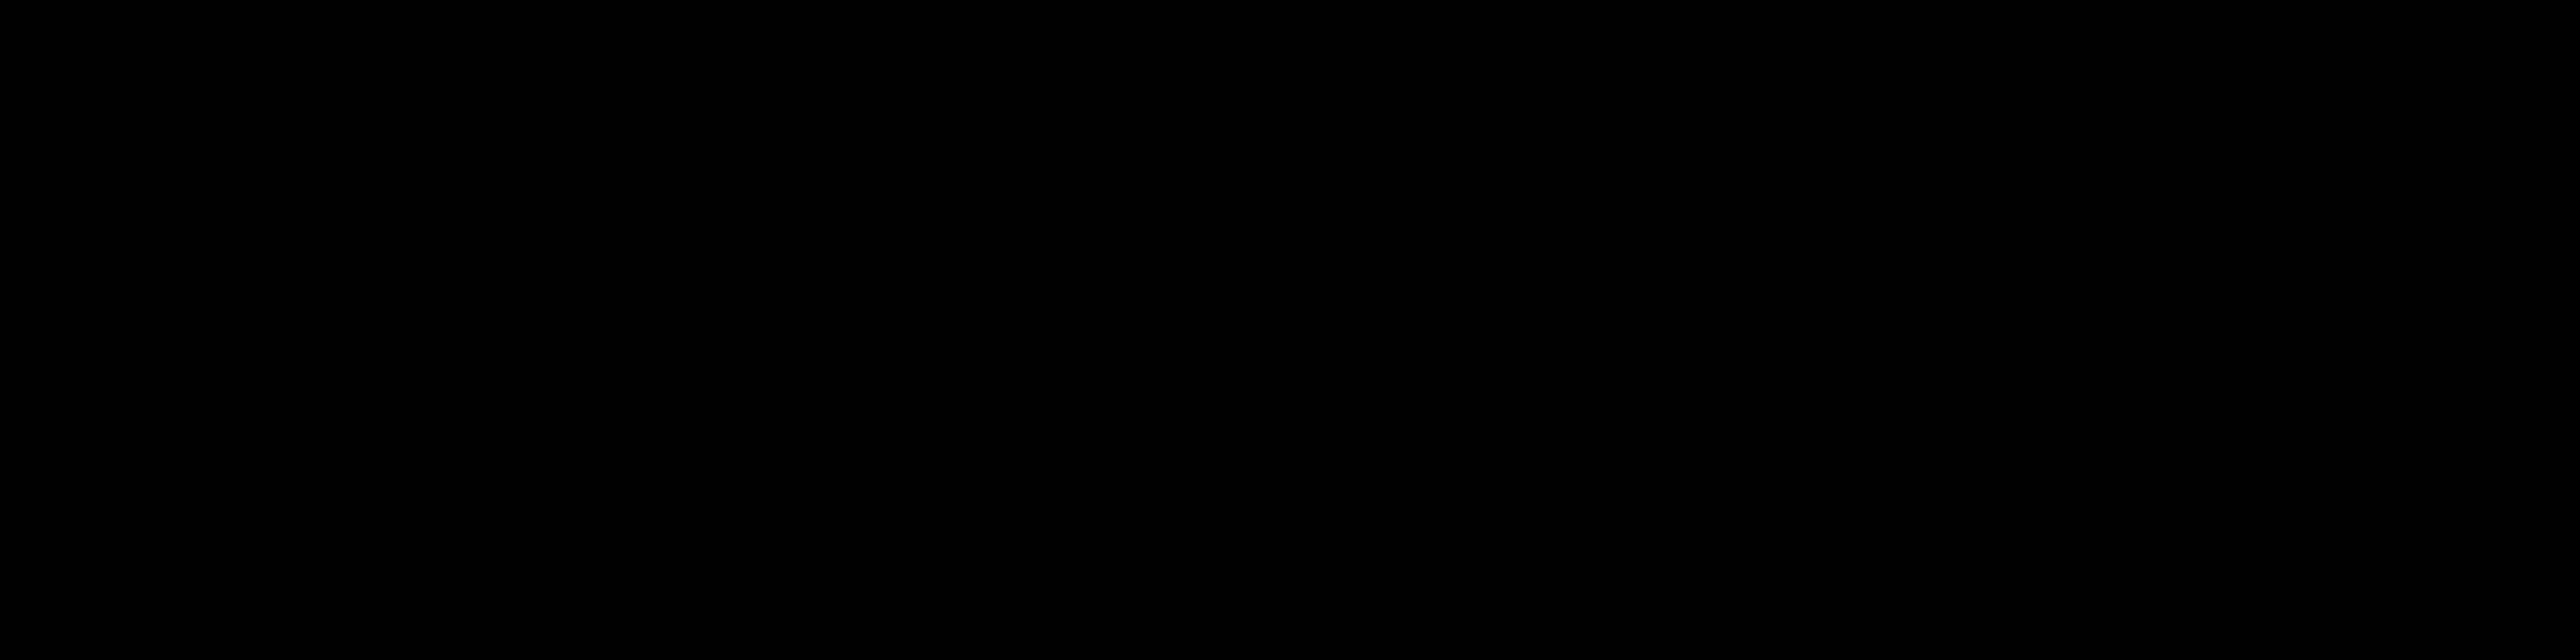 FL Studio 20 安装激活教程